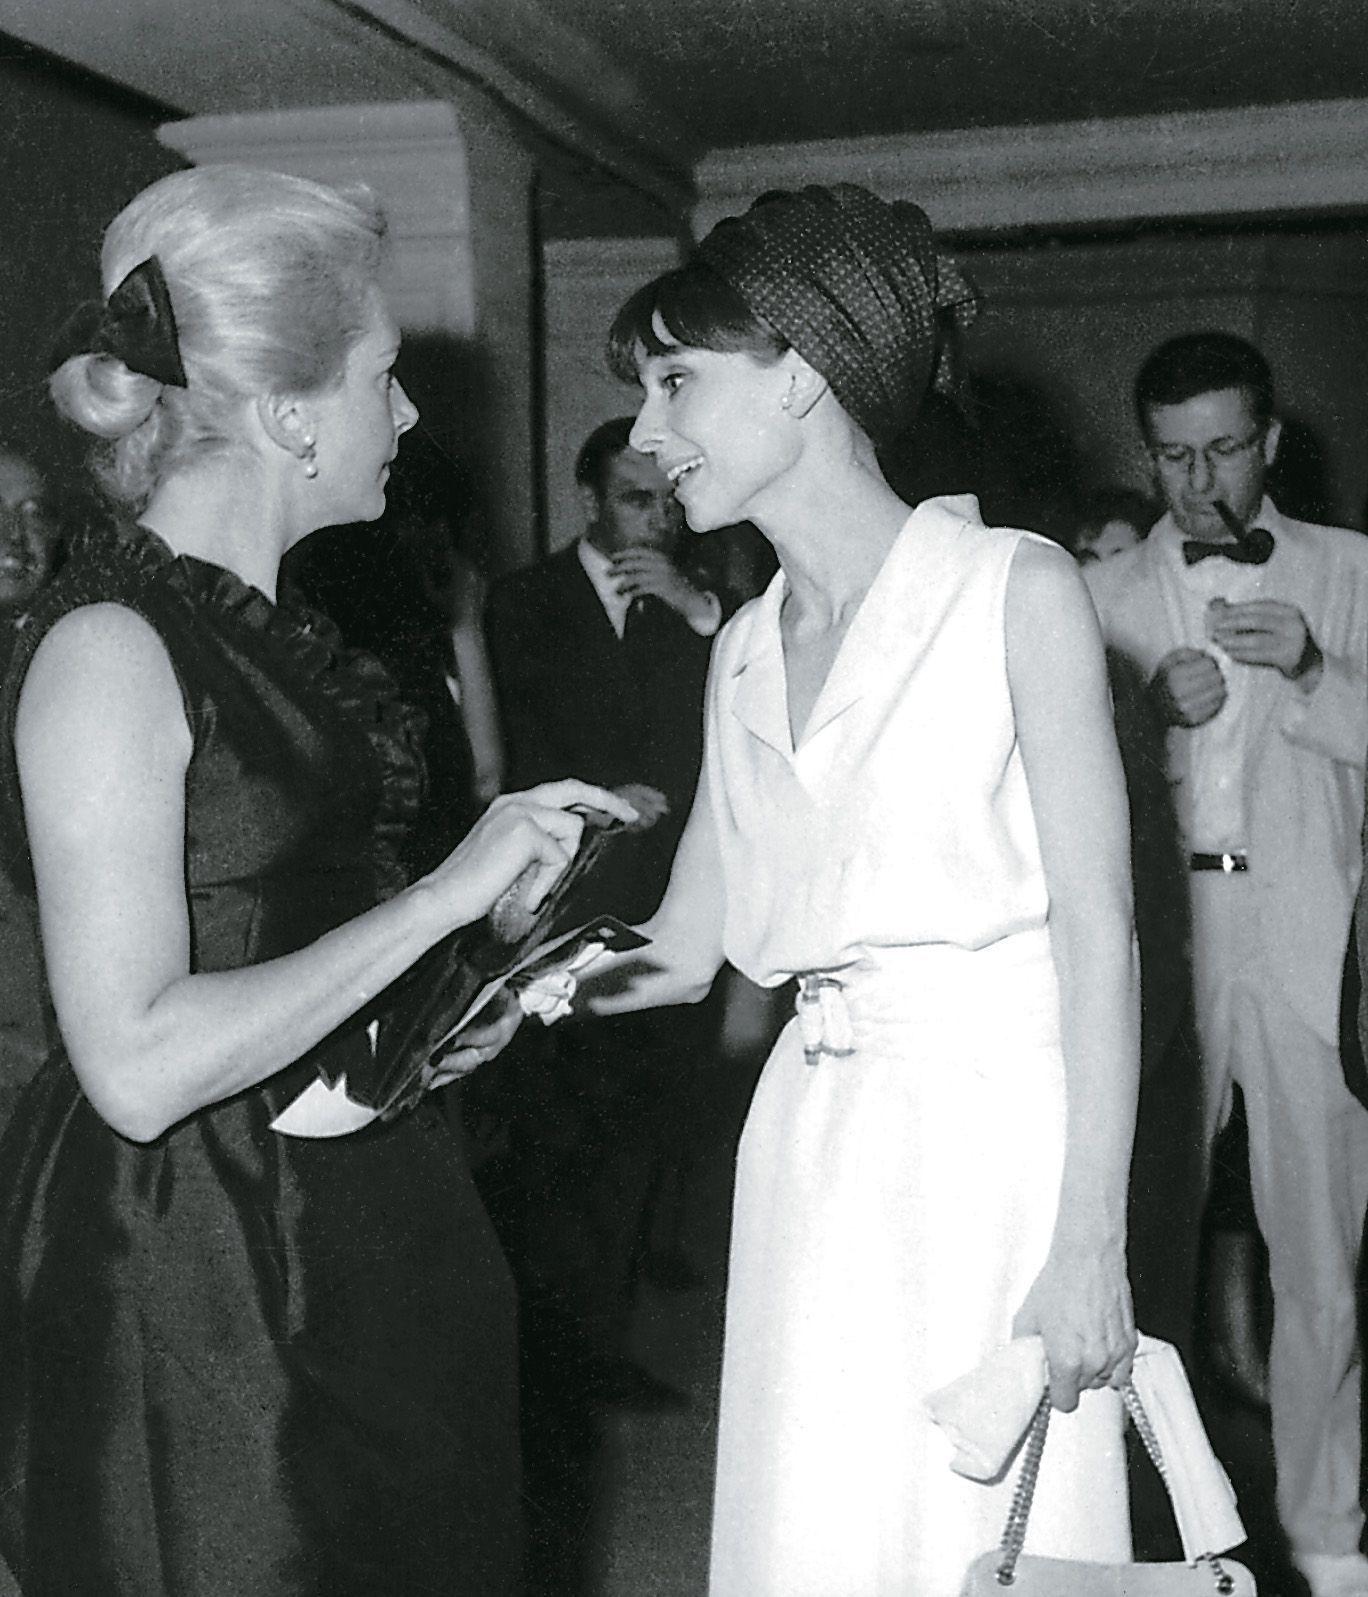 Deborah Kerr, Audrey Hepburn. Festival Internacional de Cine de San Sebastián 1964